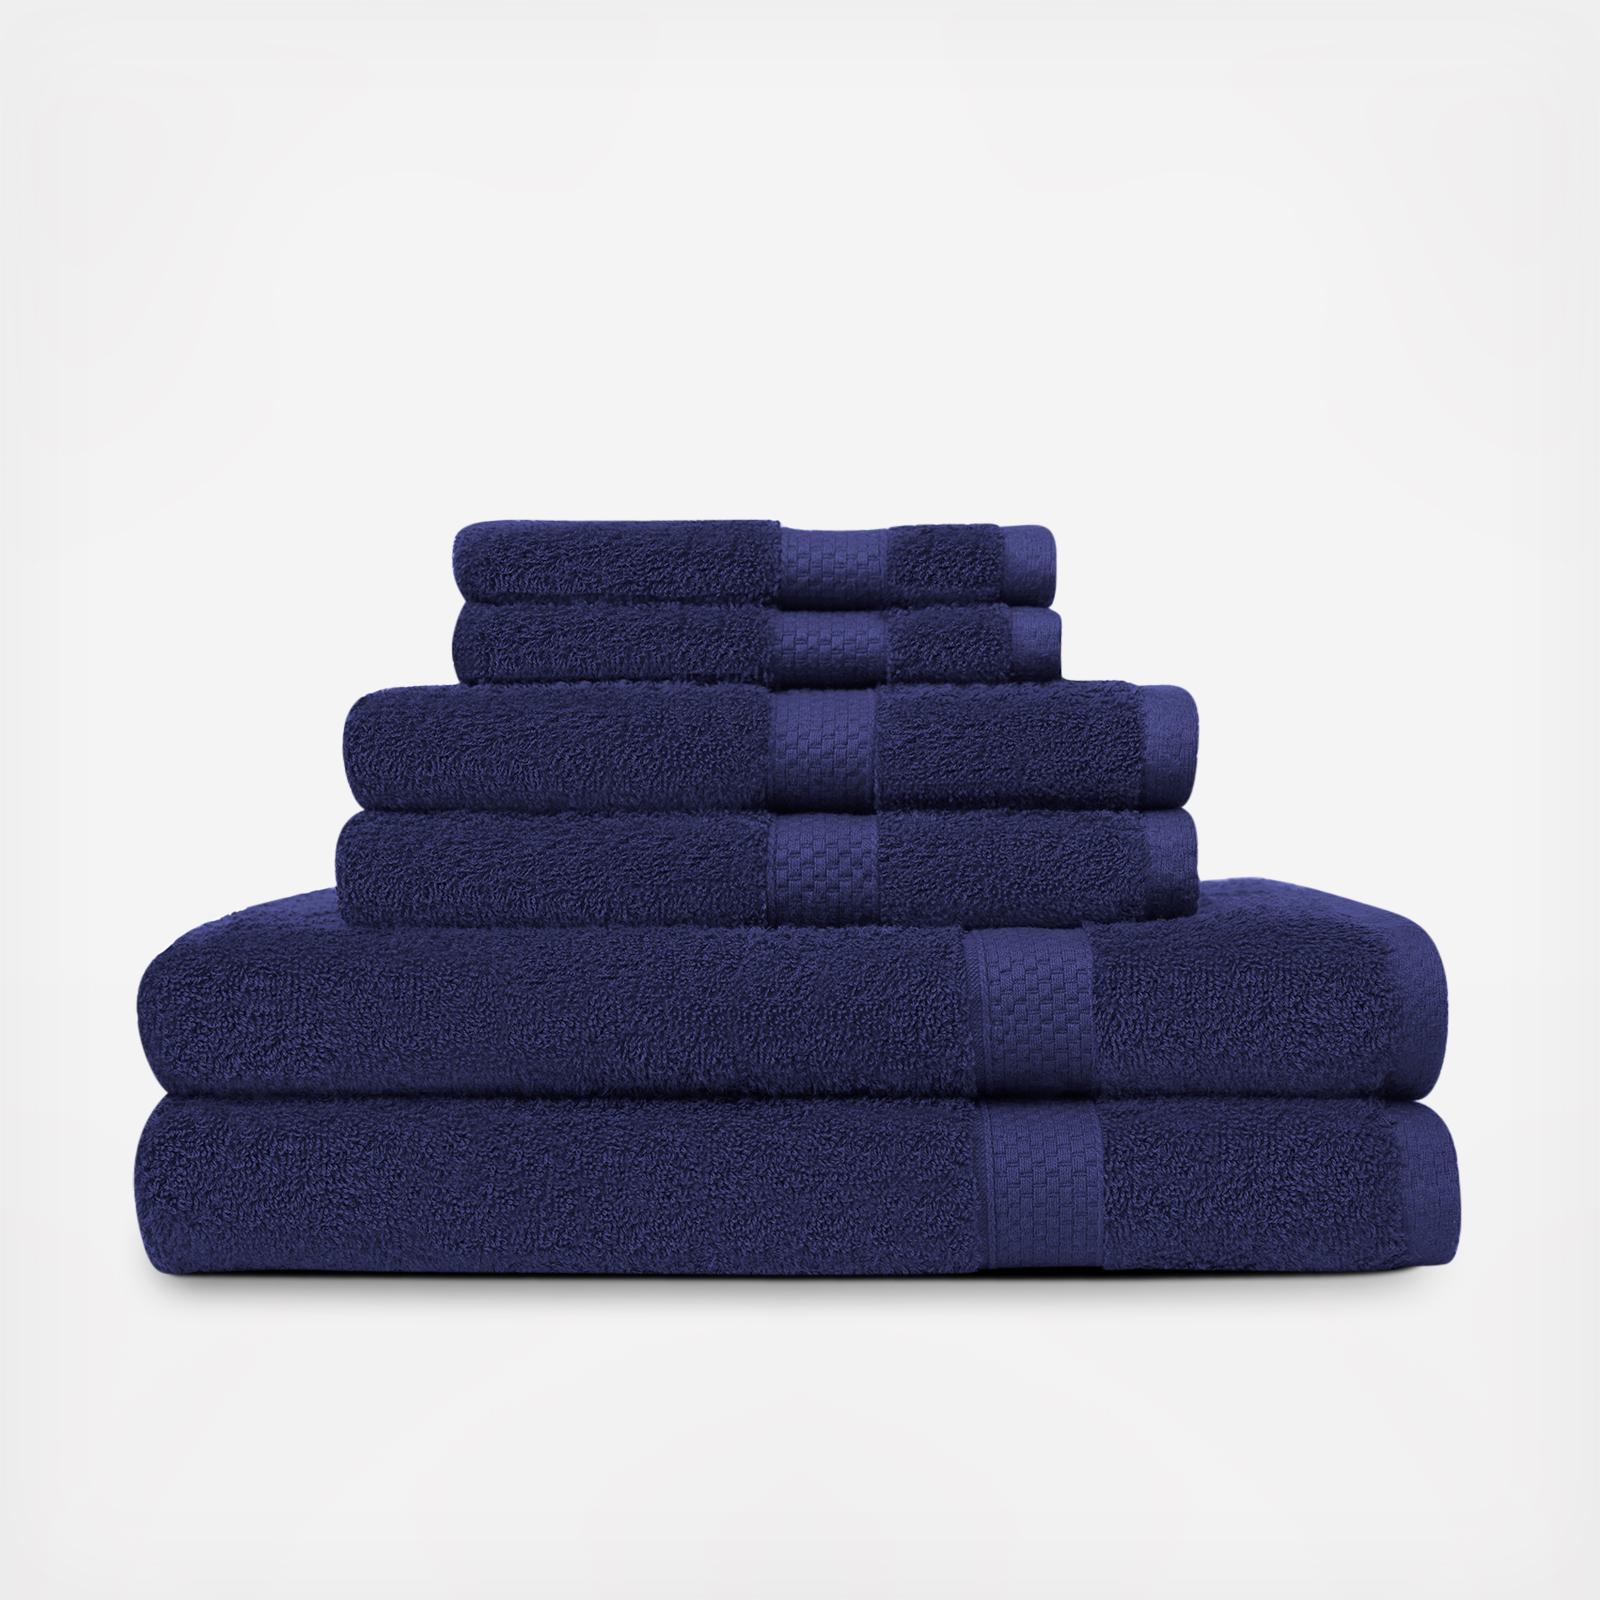 Amaze by welspun cotton sheet set bedding king navy blue - Amaze By Welspun Cotton Sheet Set Bedding King Navy Blue 41